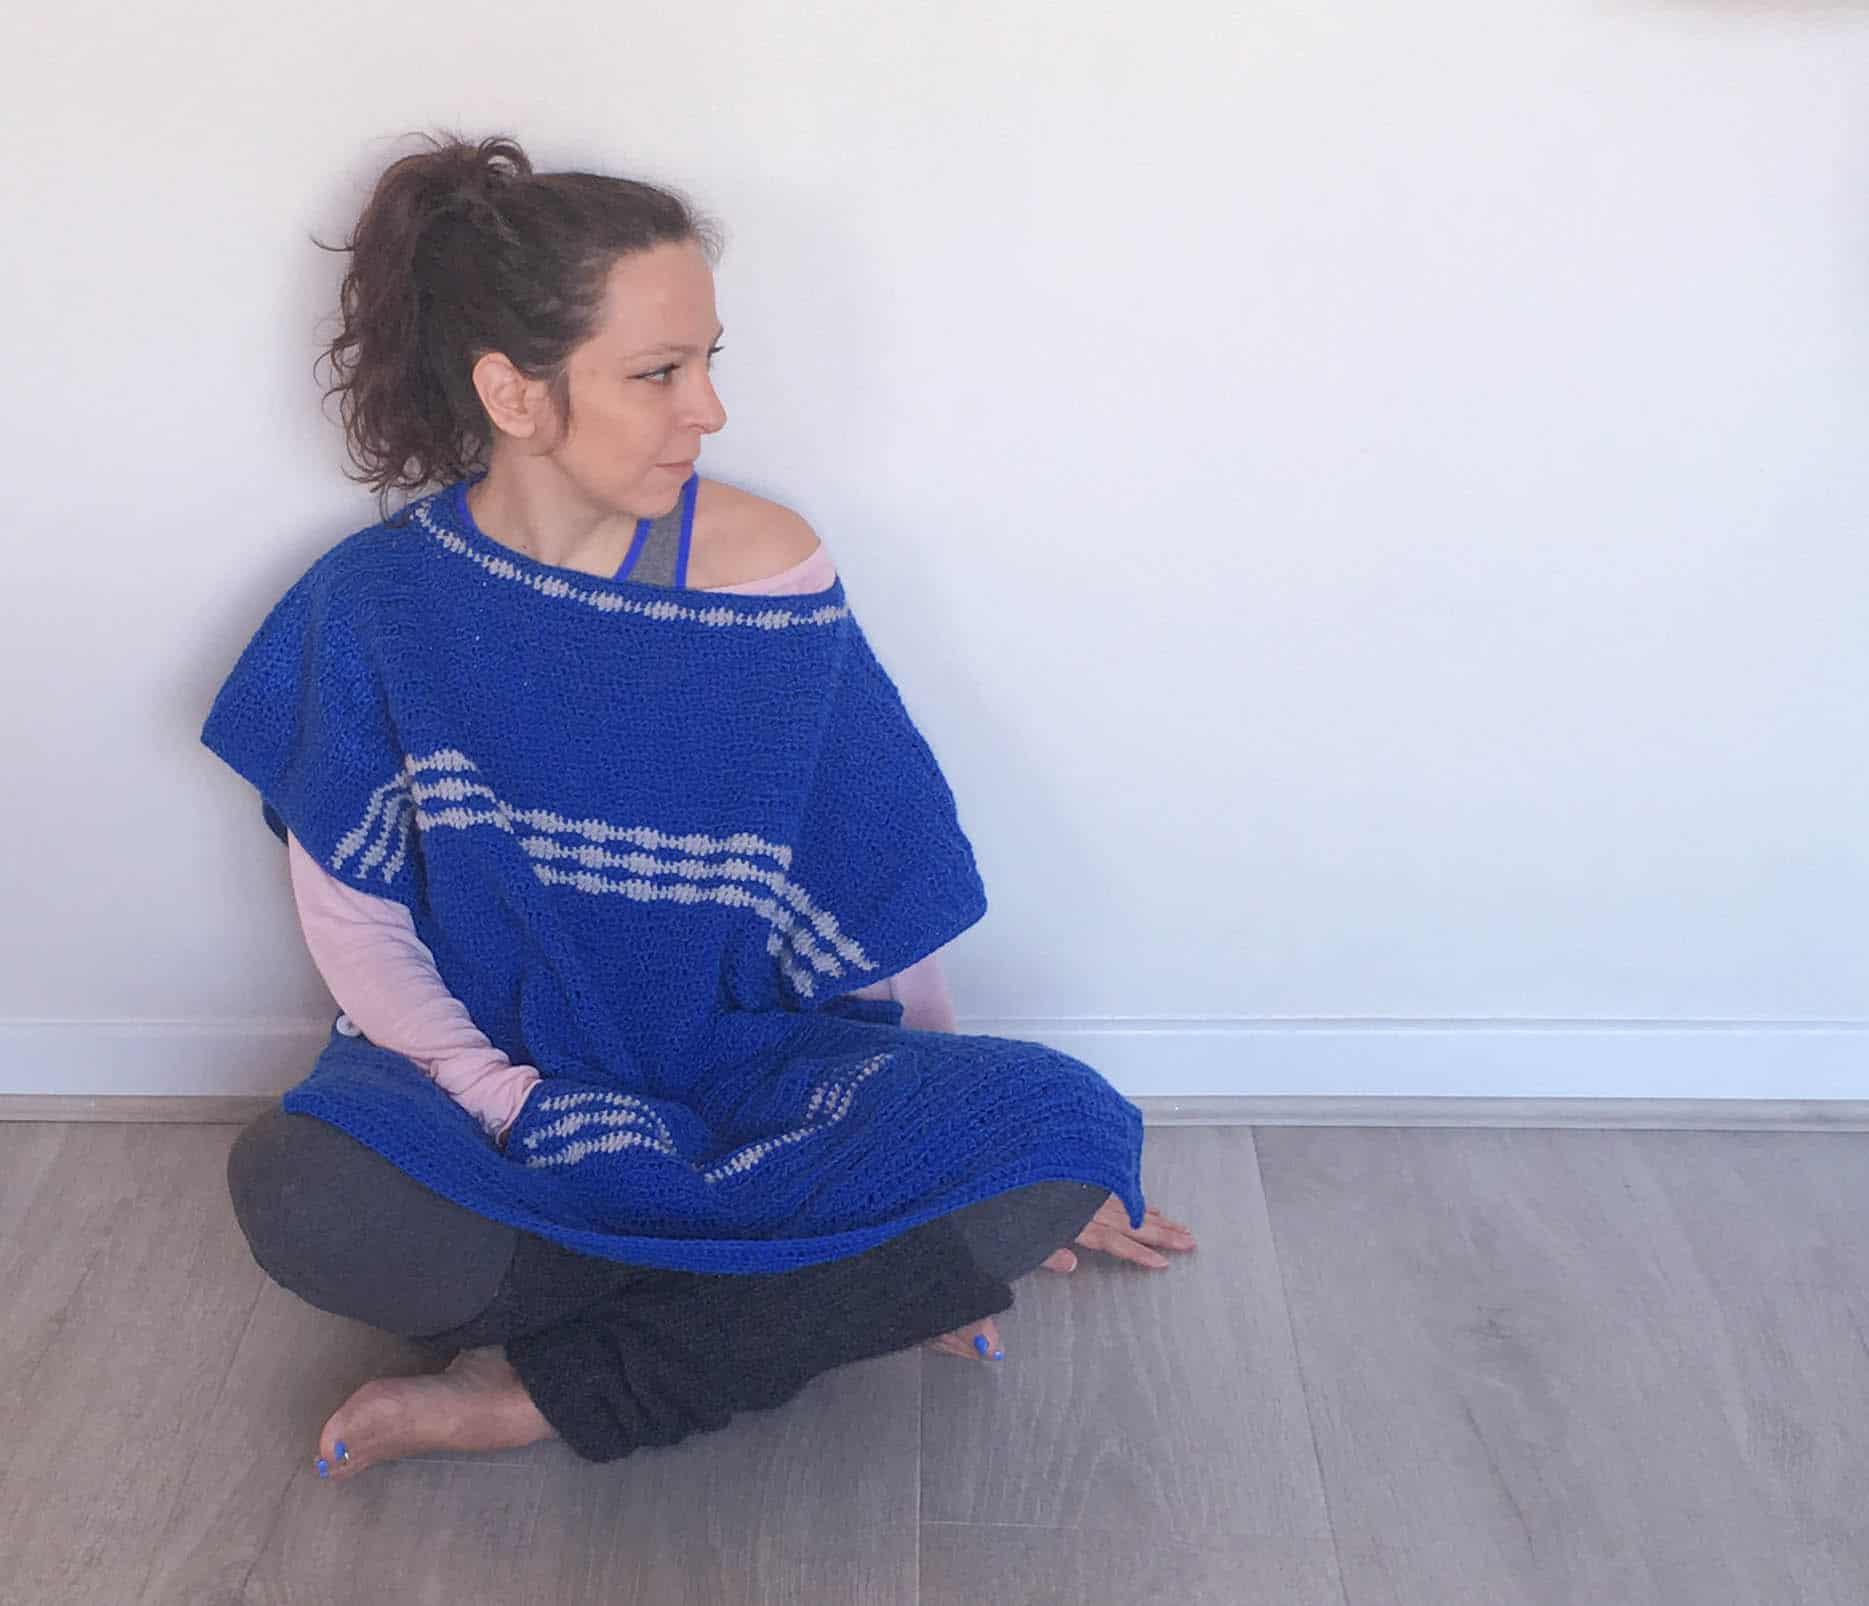 Crochet Poncho pockets stripes pattern